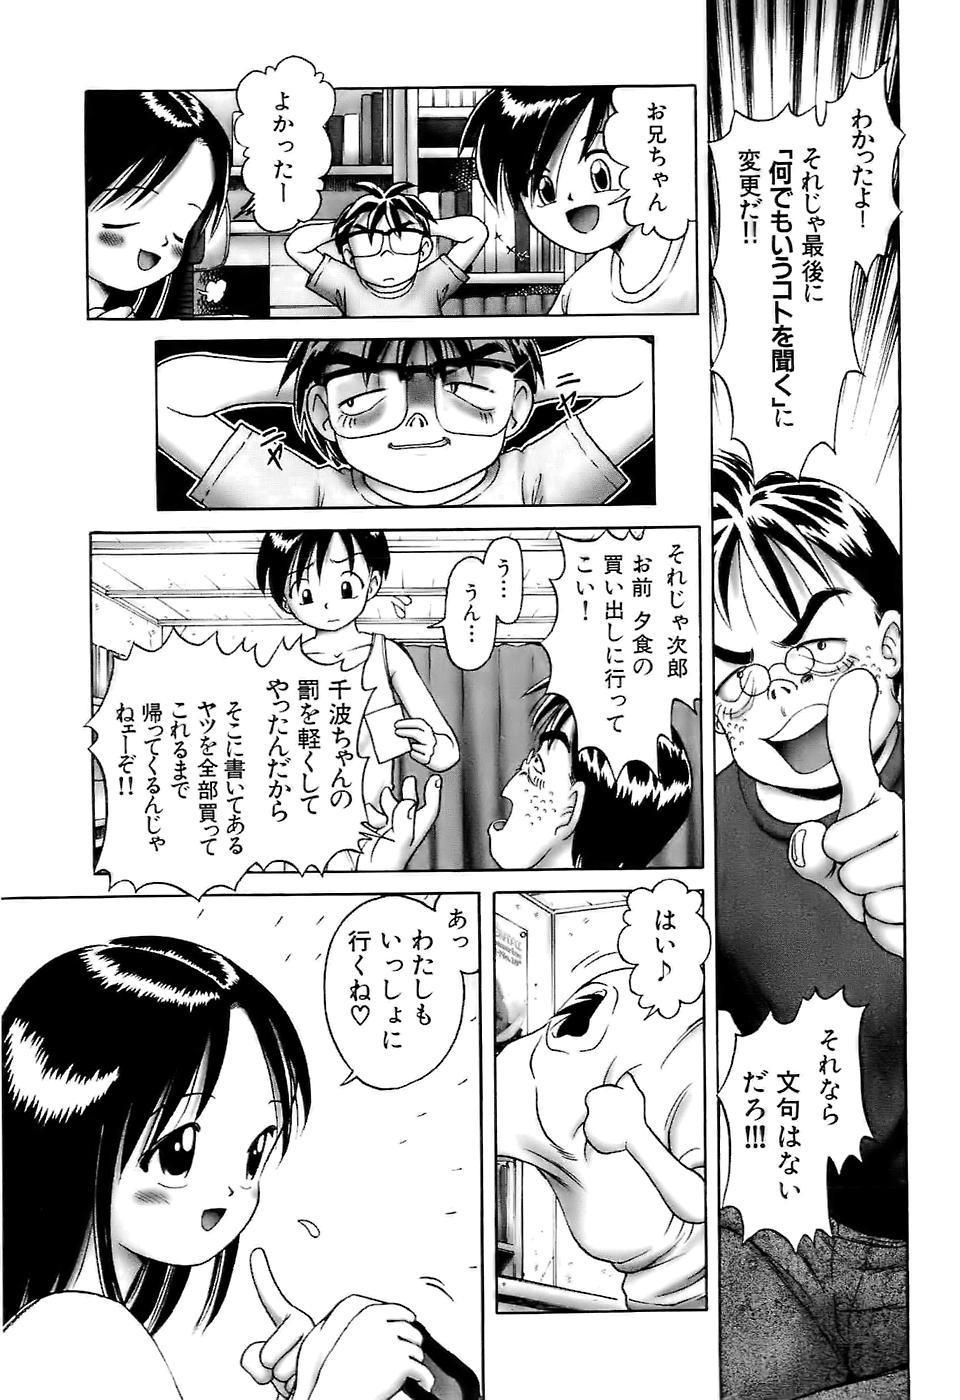 [Bow Rei] Osanai Kajitsu -Inkou Shougakusei no Houkago- Jou 16